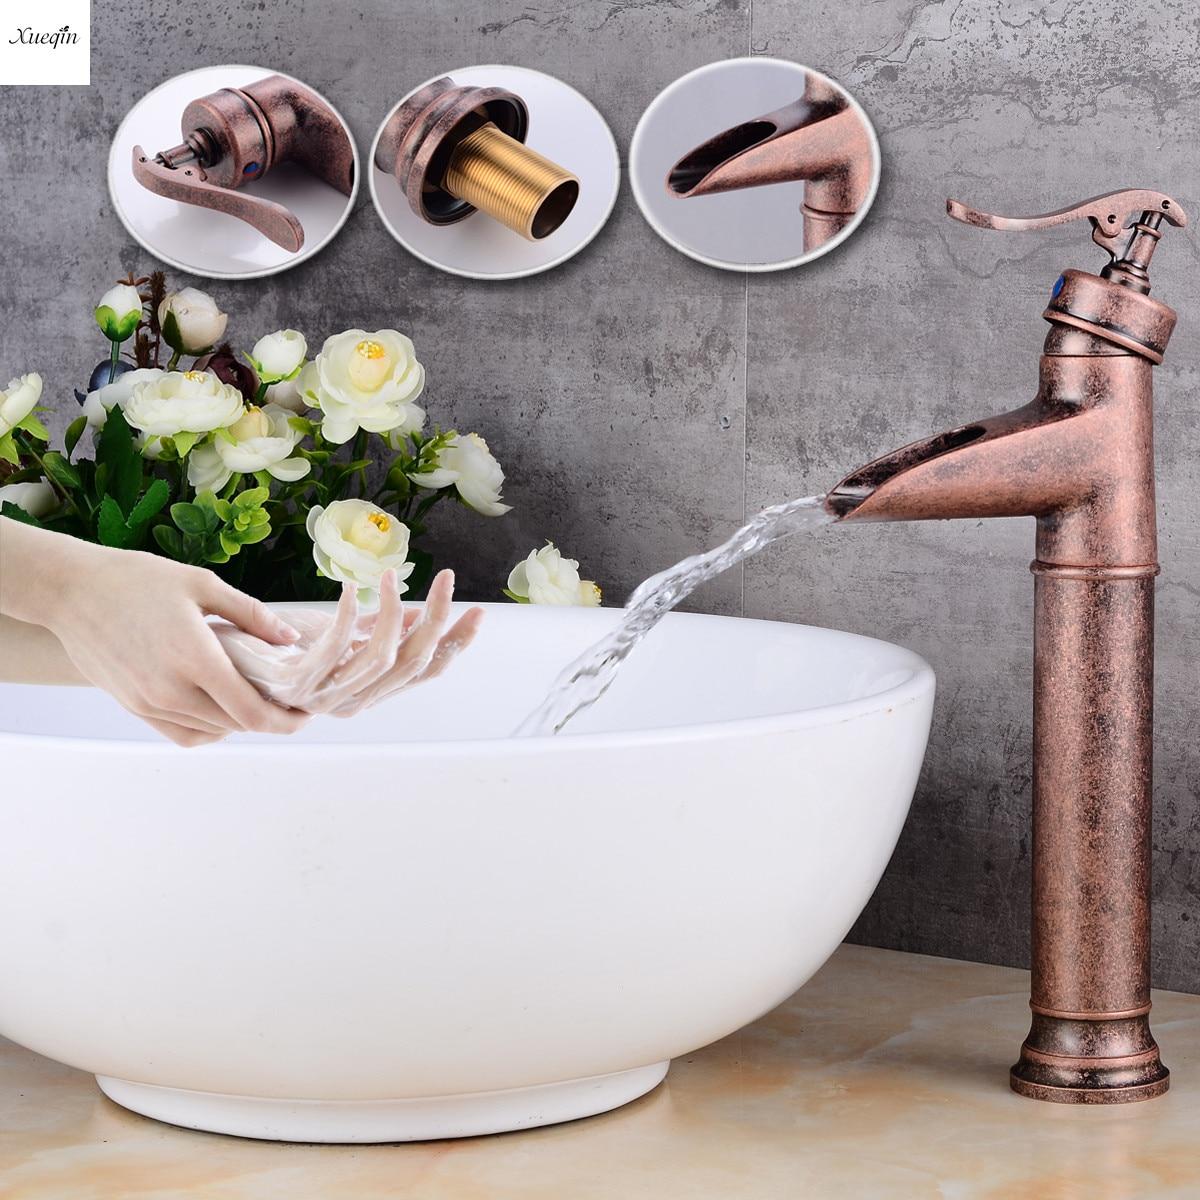 купить European Basin Hot And Cold Faucet Copper Elevated Platform Bathroom Basin Faucet Single Handle Wide Mouth Waterfall Mixer Taps по цене 2989.85 рублей